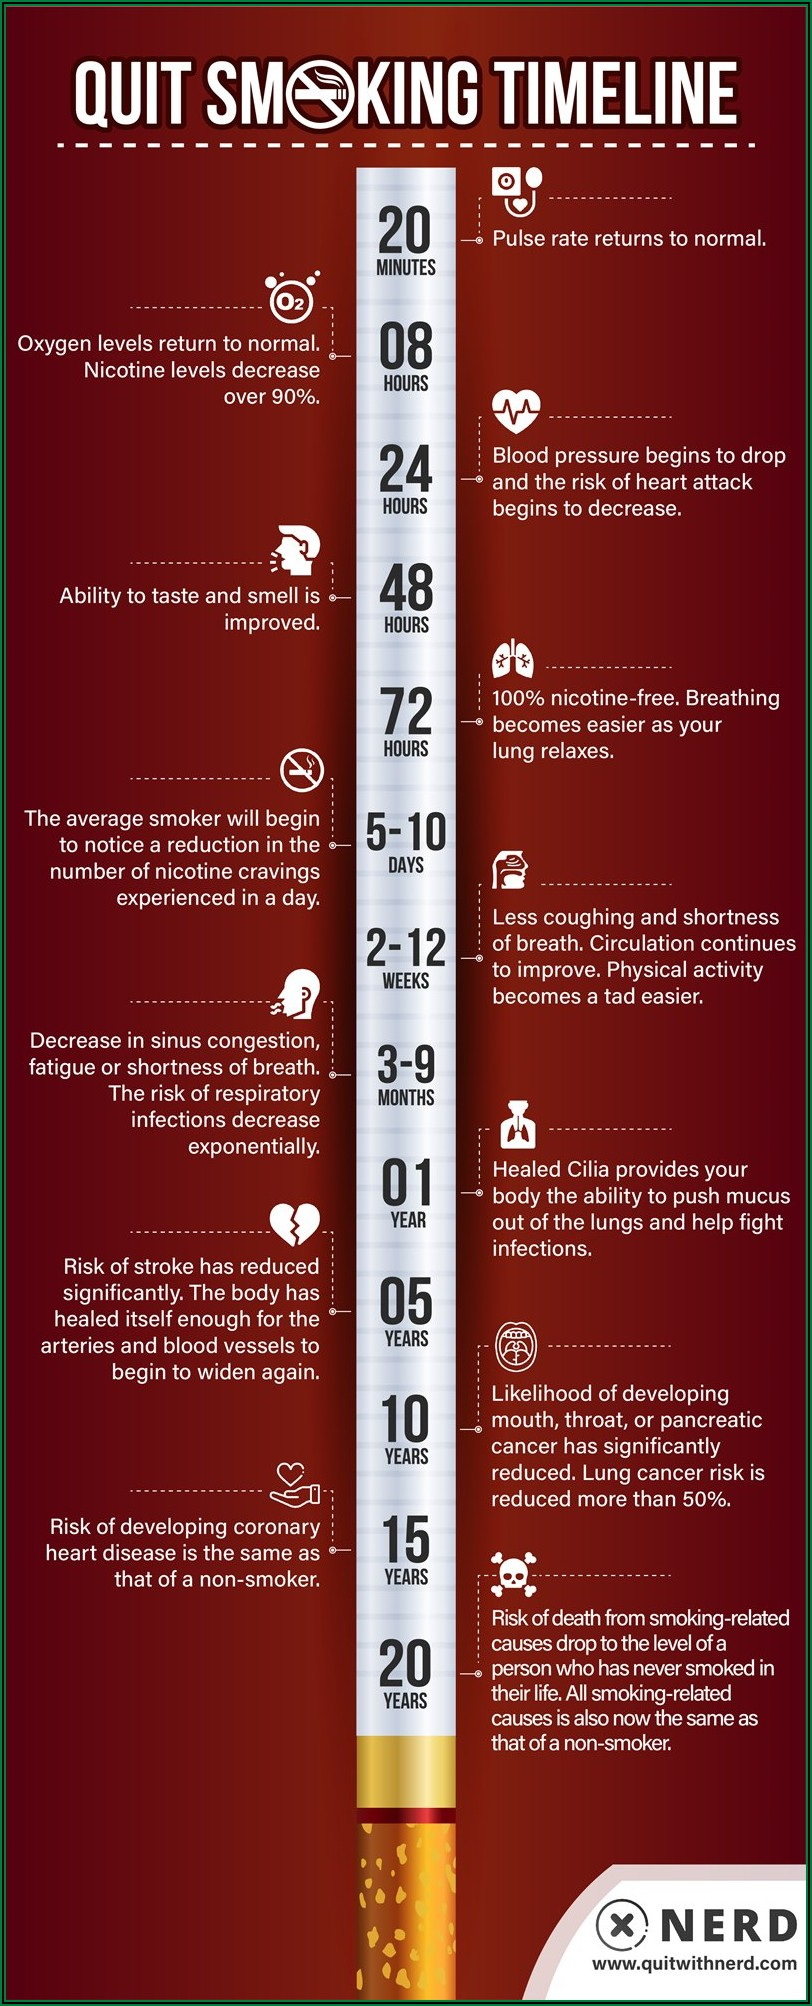 Smoking Quit Benefits Timeline